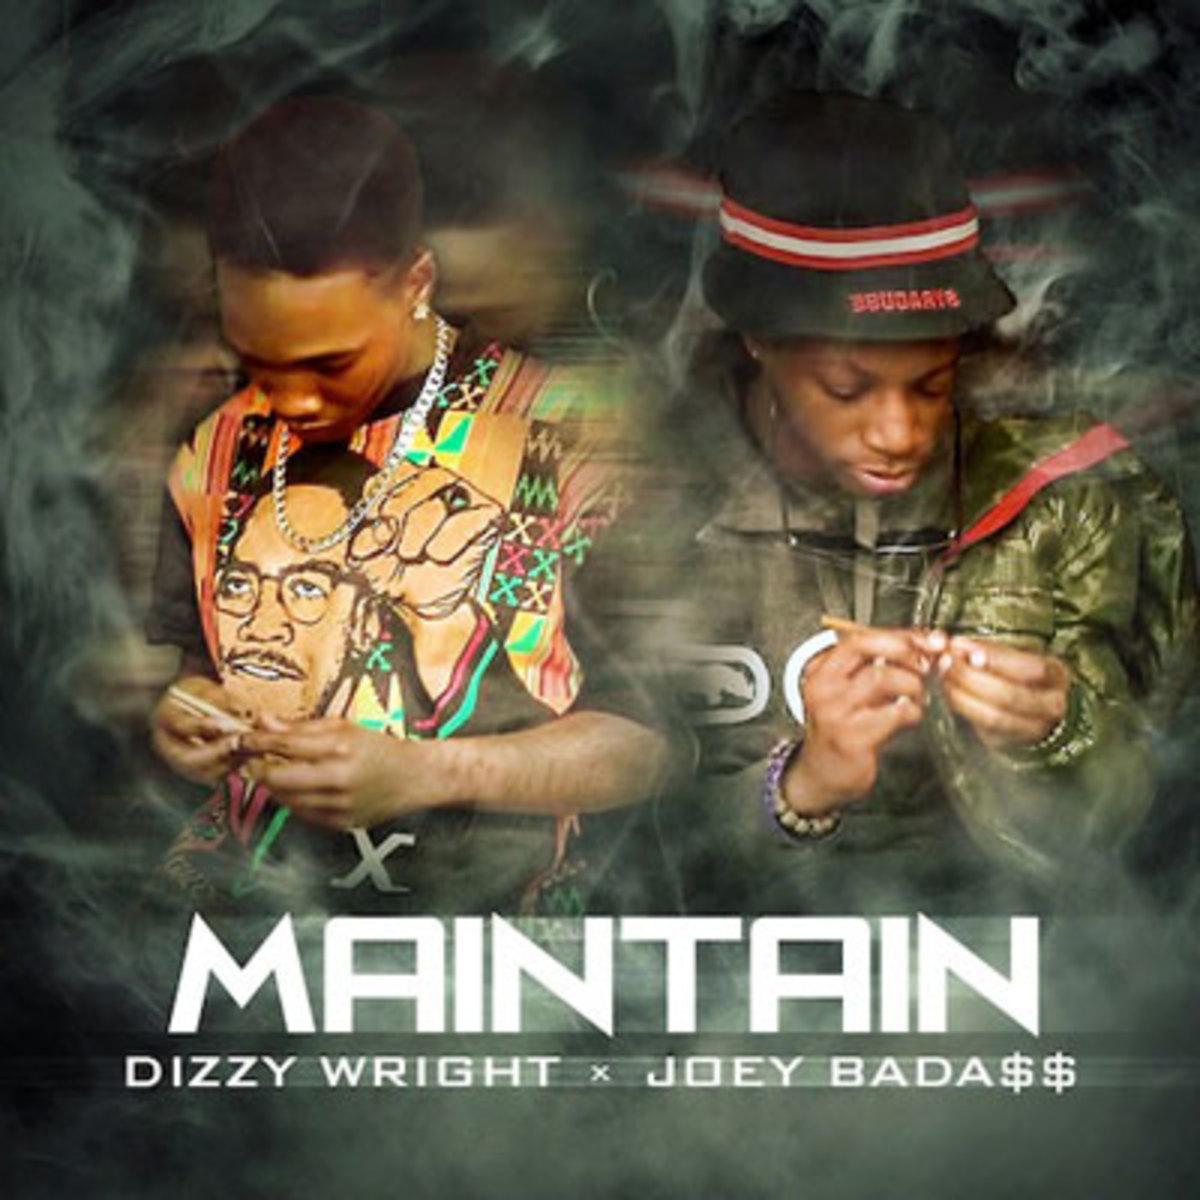 dizzywright-maintain.jpg